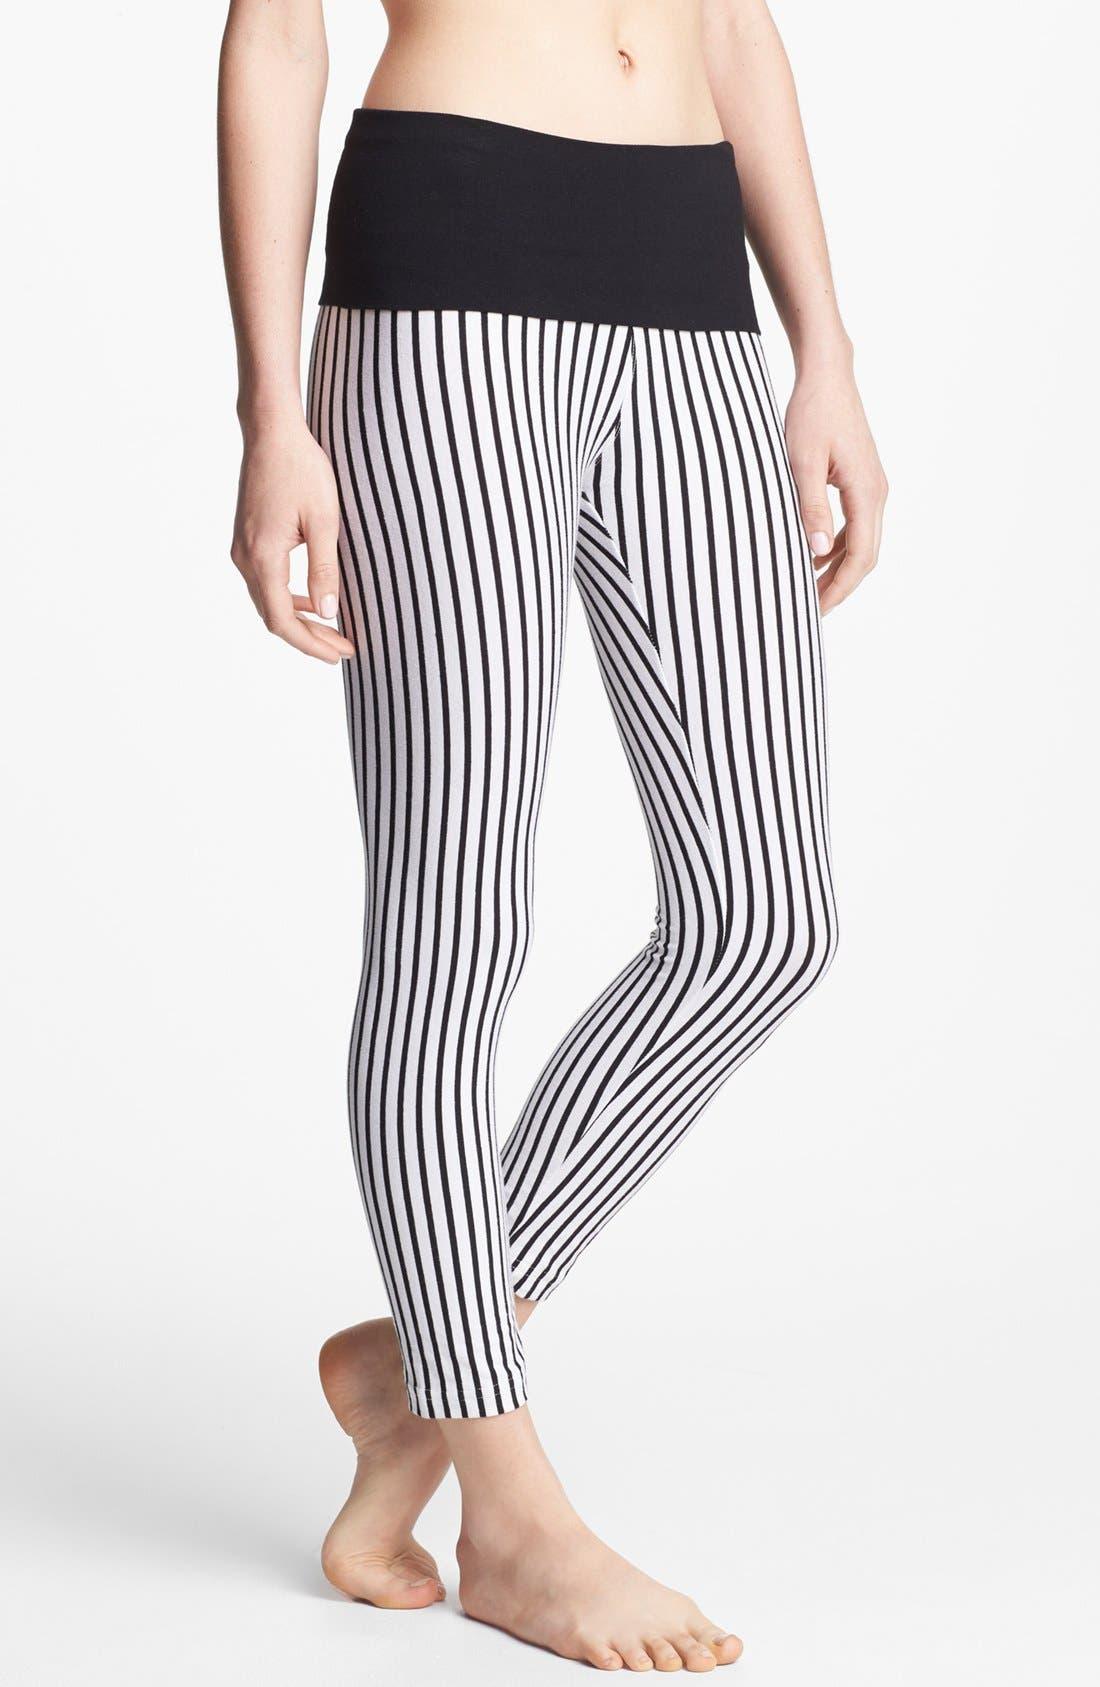 Alternate Image 1 Selected - Hard Tail Vertical Stripe Leggings (Online Only)